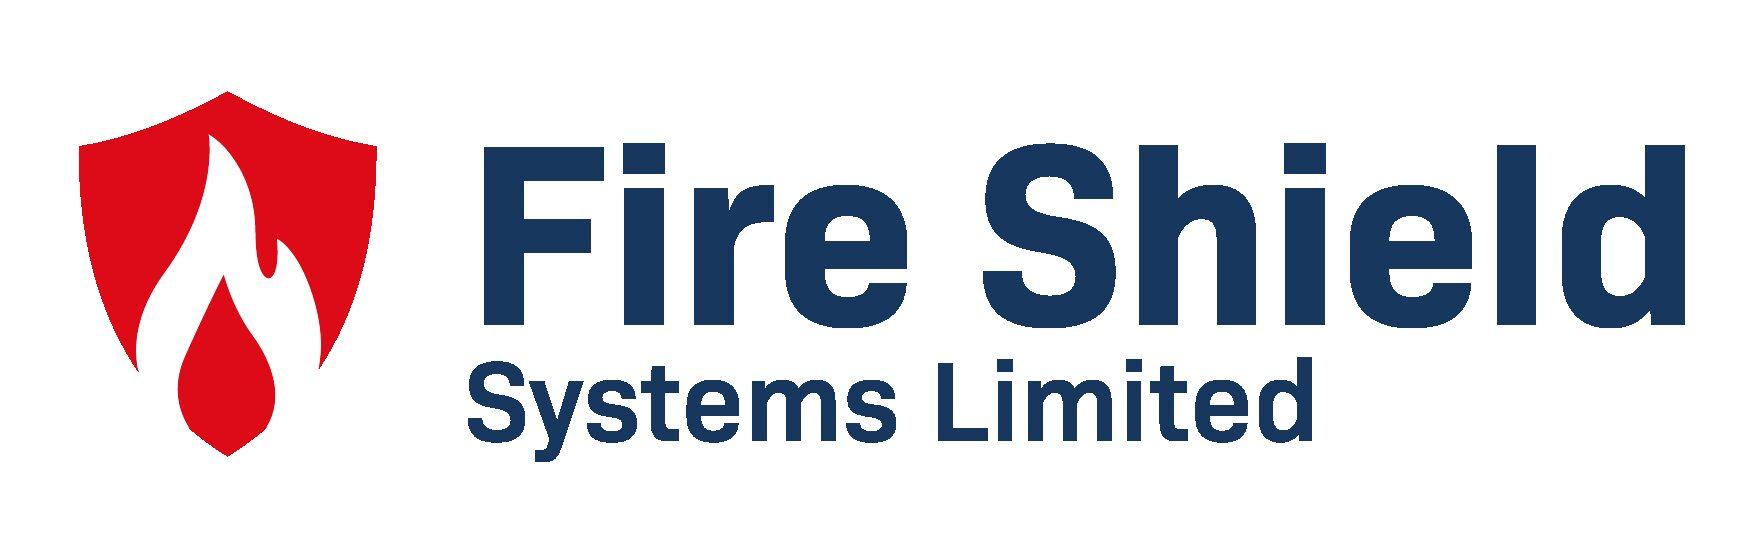 Fire Shield Systems Ltd logo